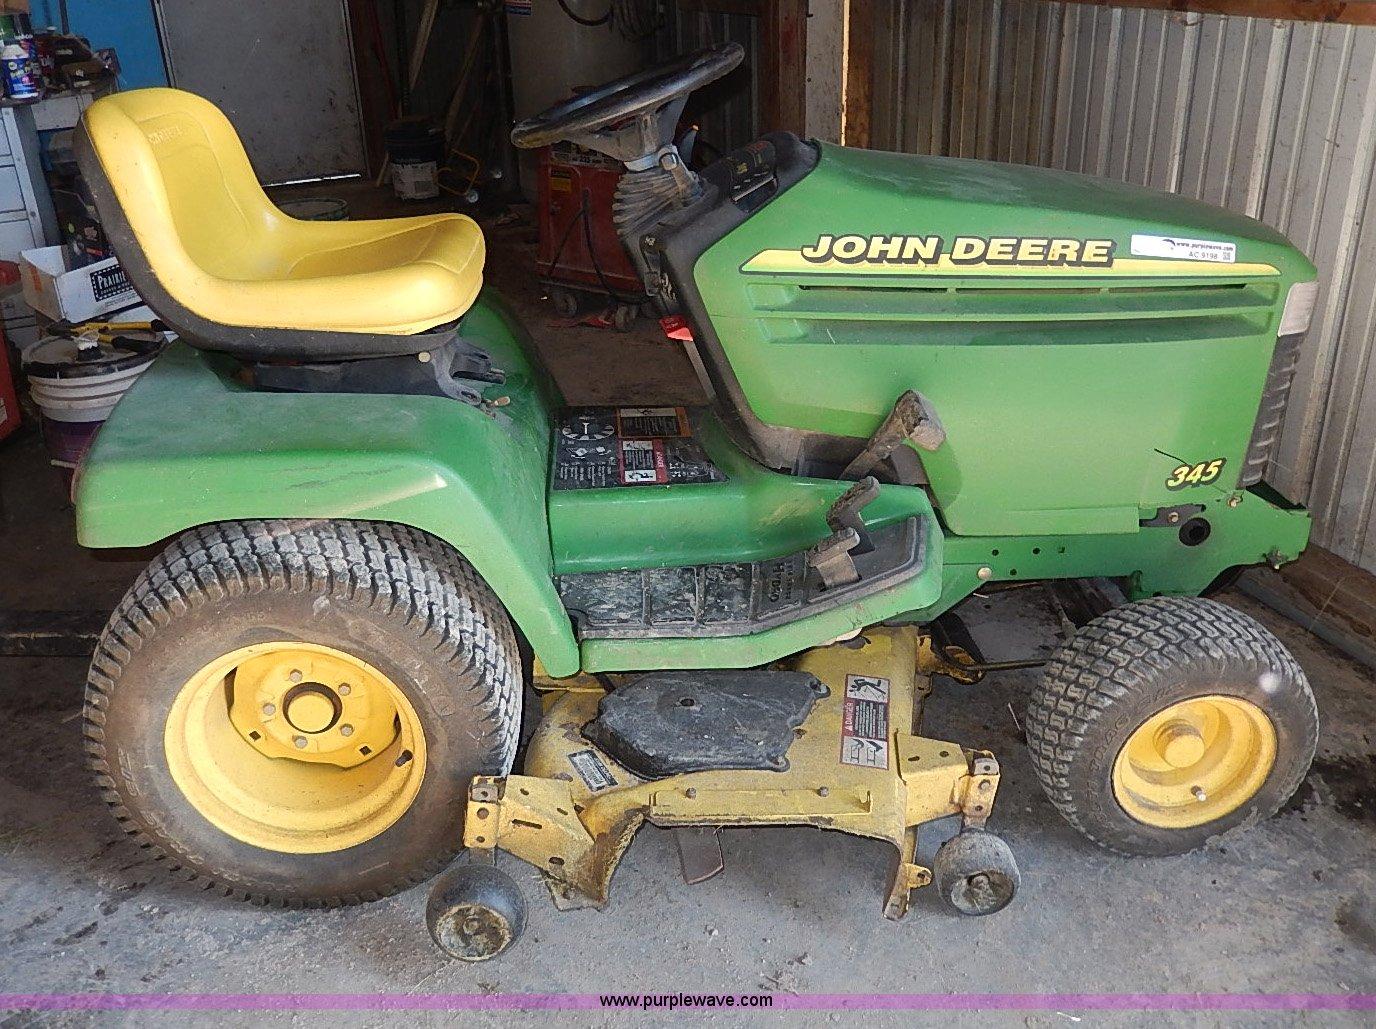 John Deere 345 >> John Deere 345 Riding Mower Item Ac9198 Sold April 30 V